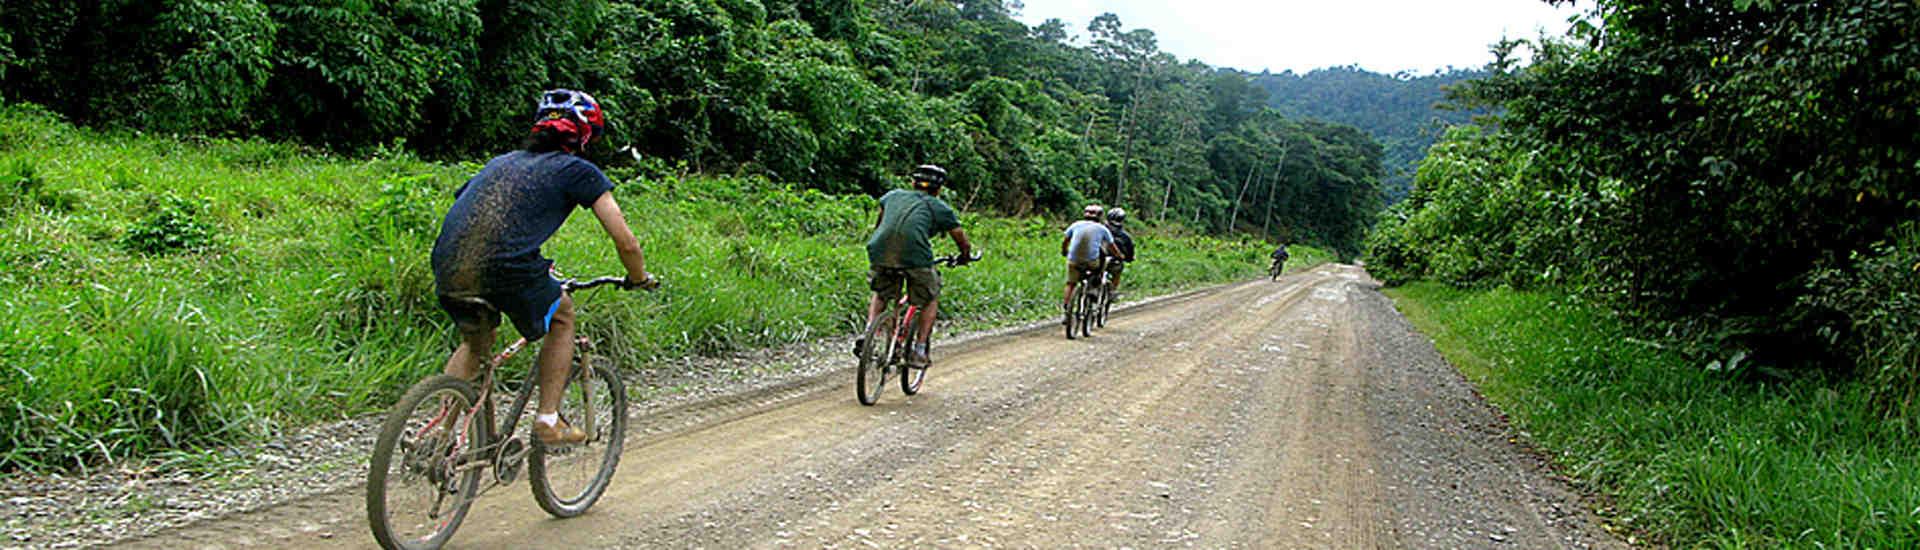 inka jungle trek machu picchu toursperumachupicchu agencia de viajes